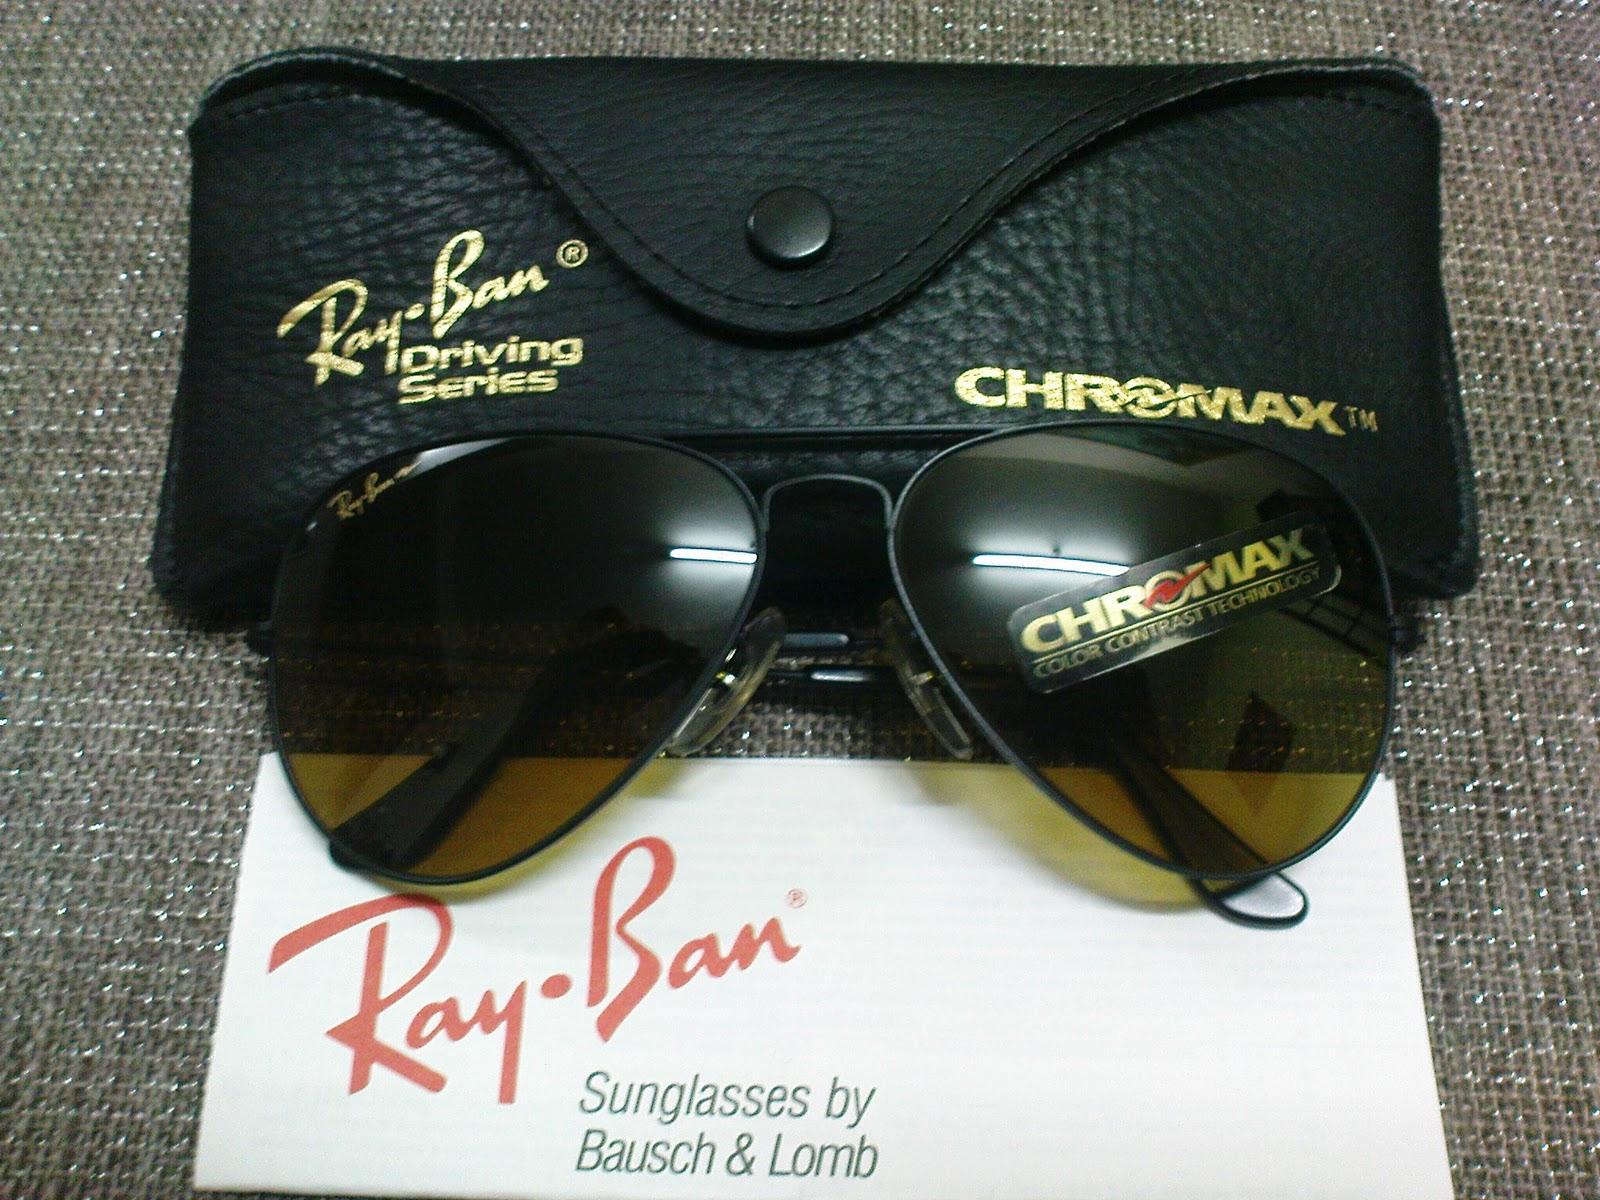 ray ban aviator driving series chromax